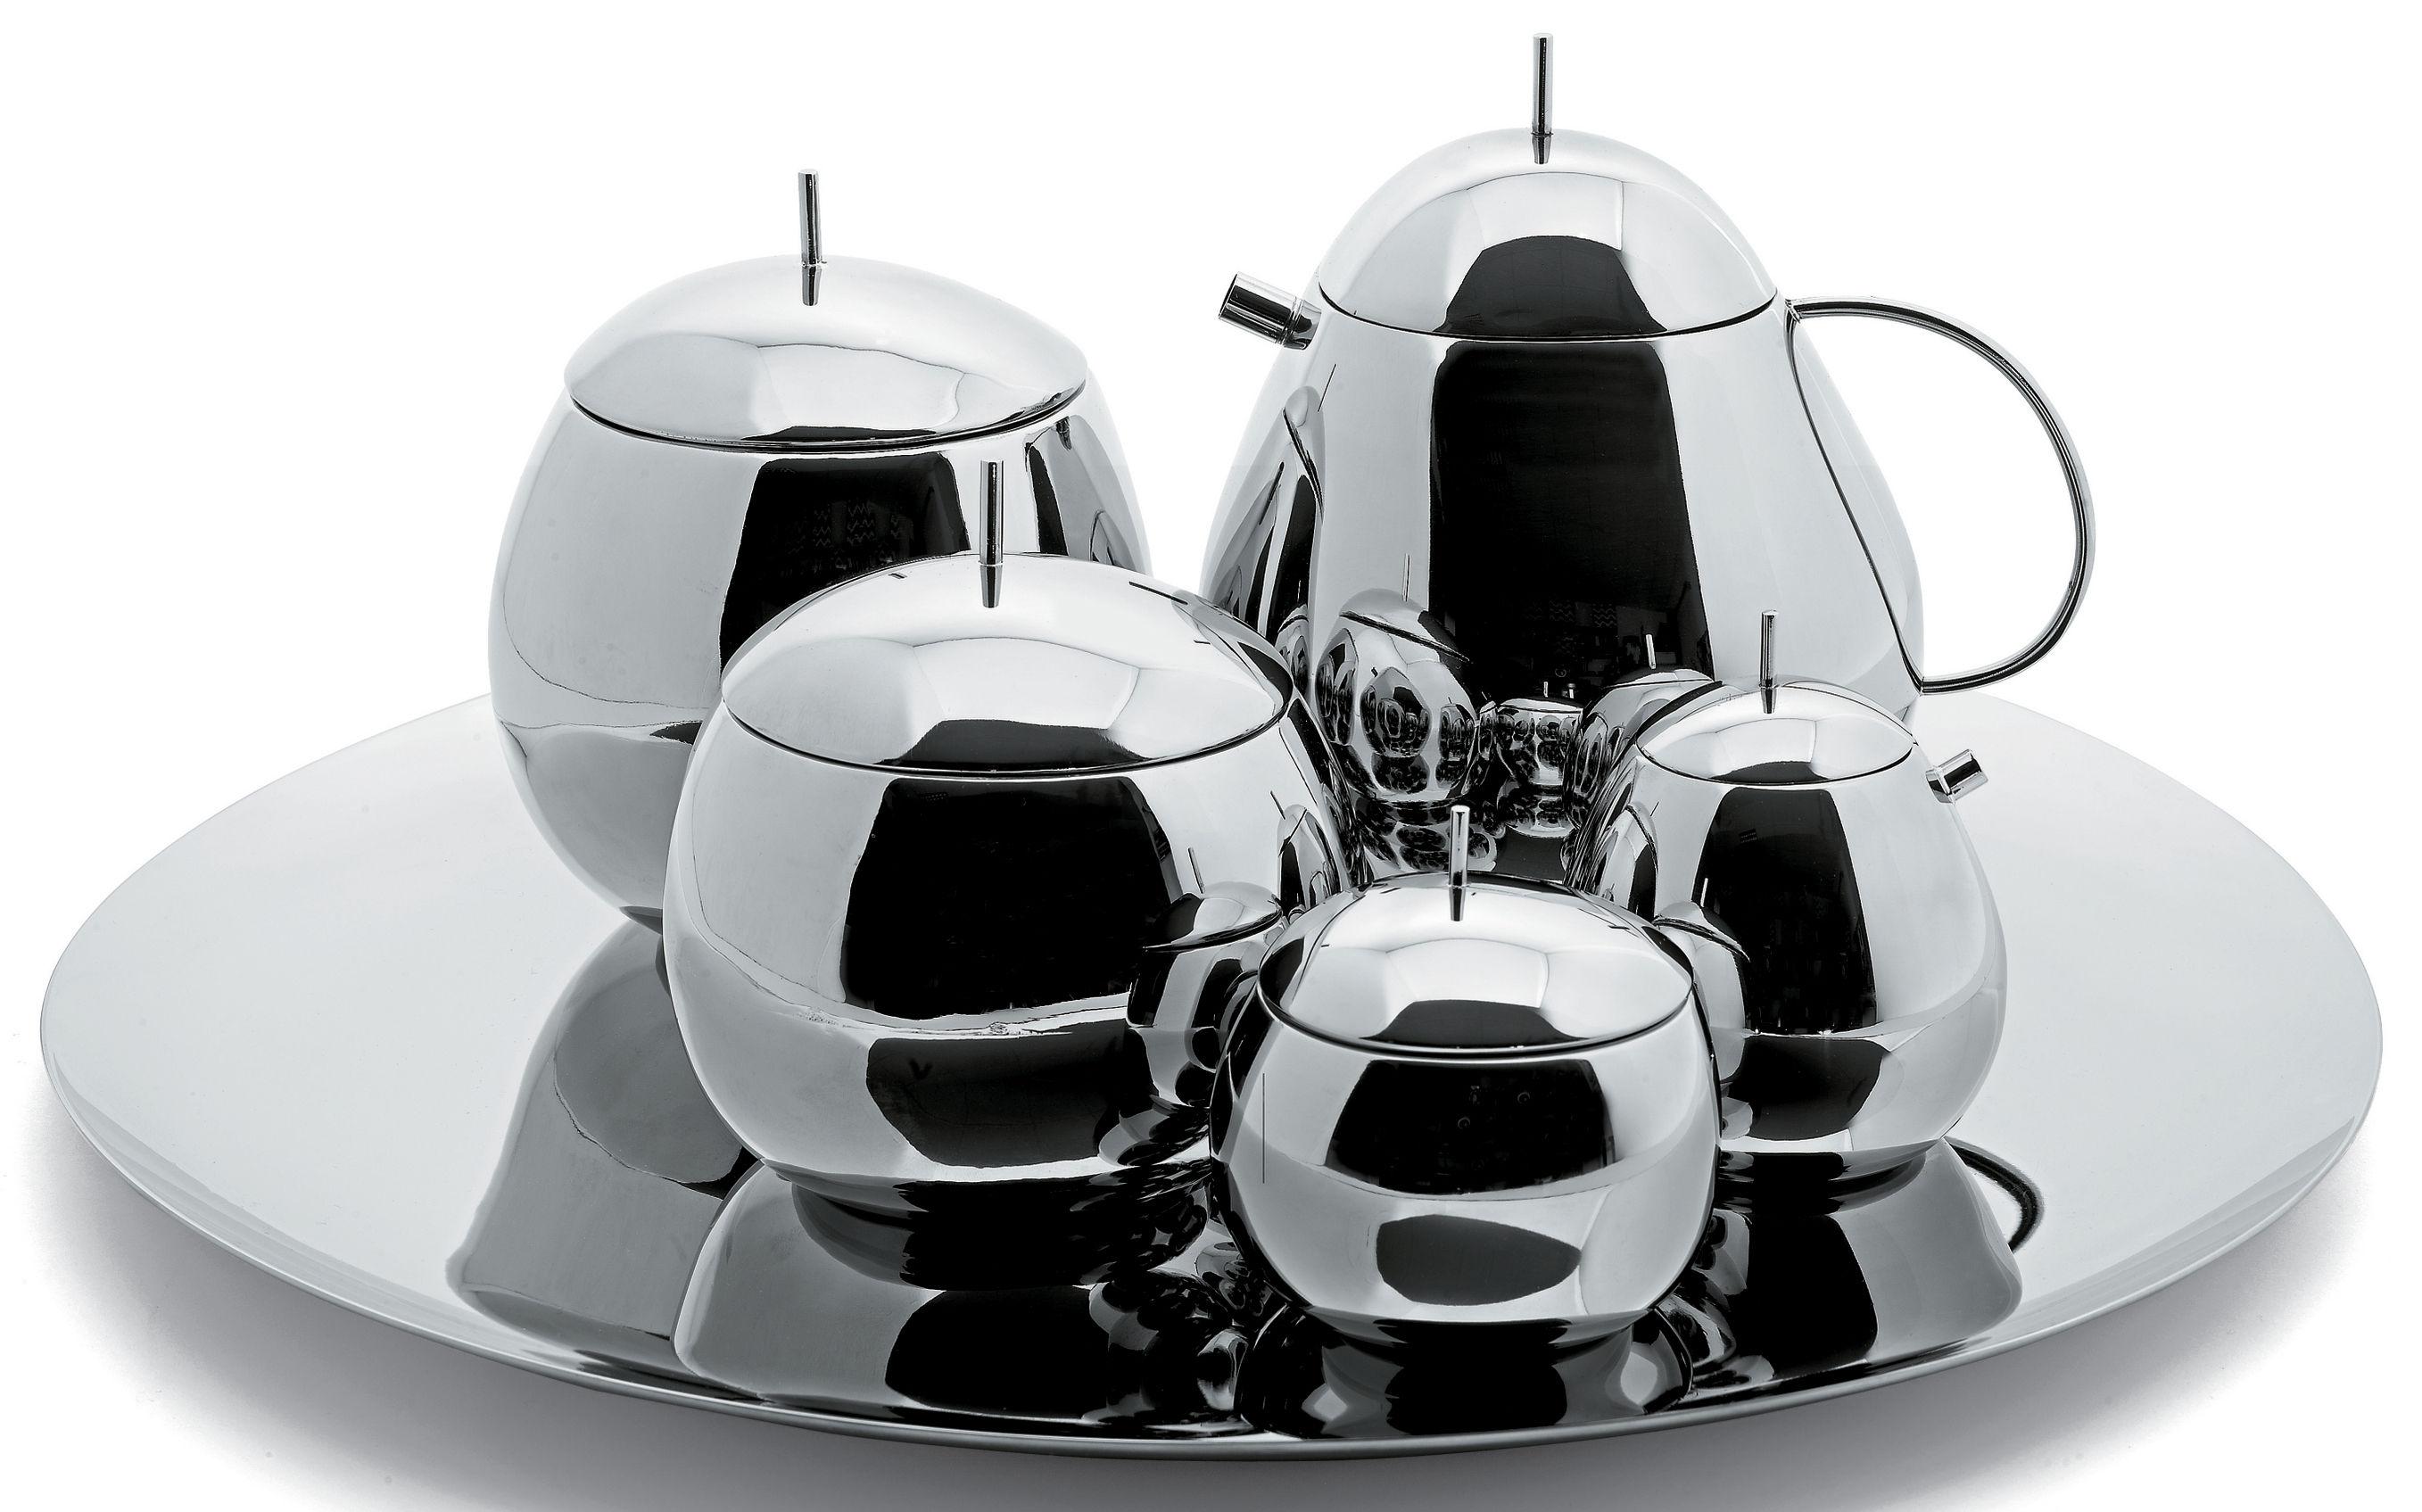 Fruit basket teapot steel by alessi - Alessi fruit basket ...